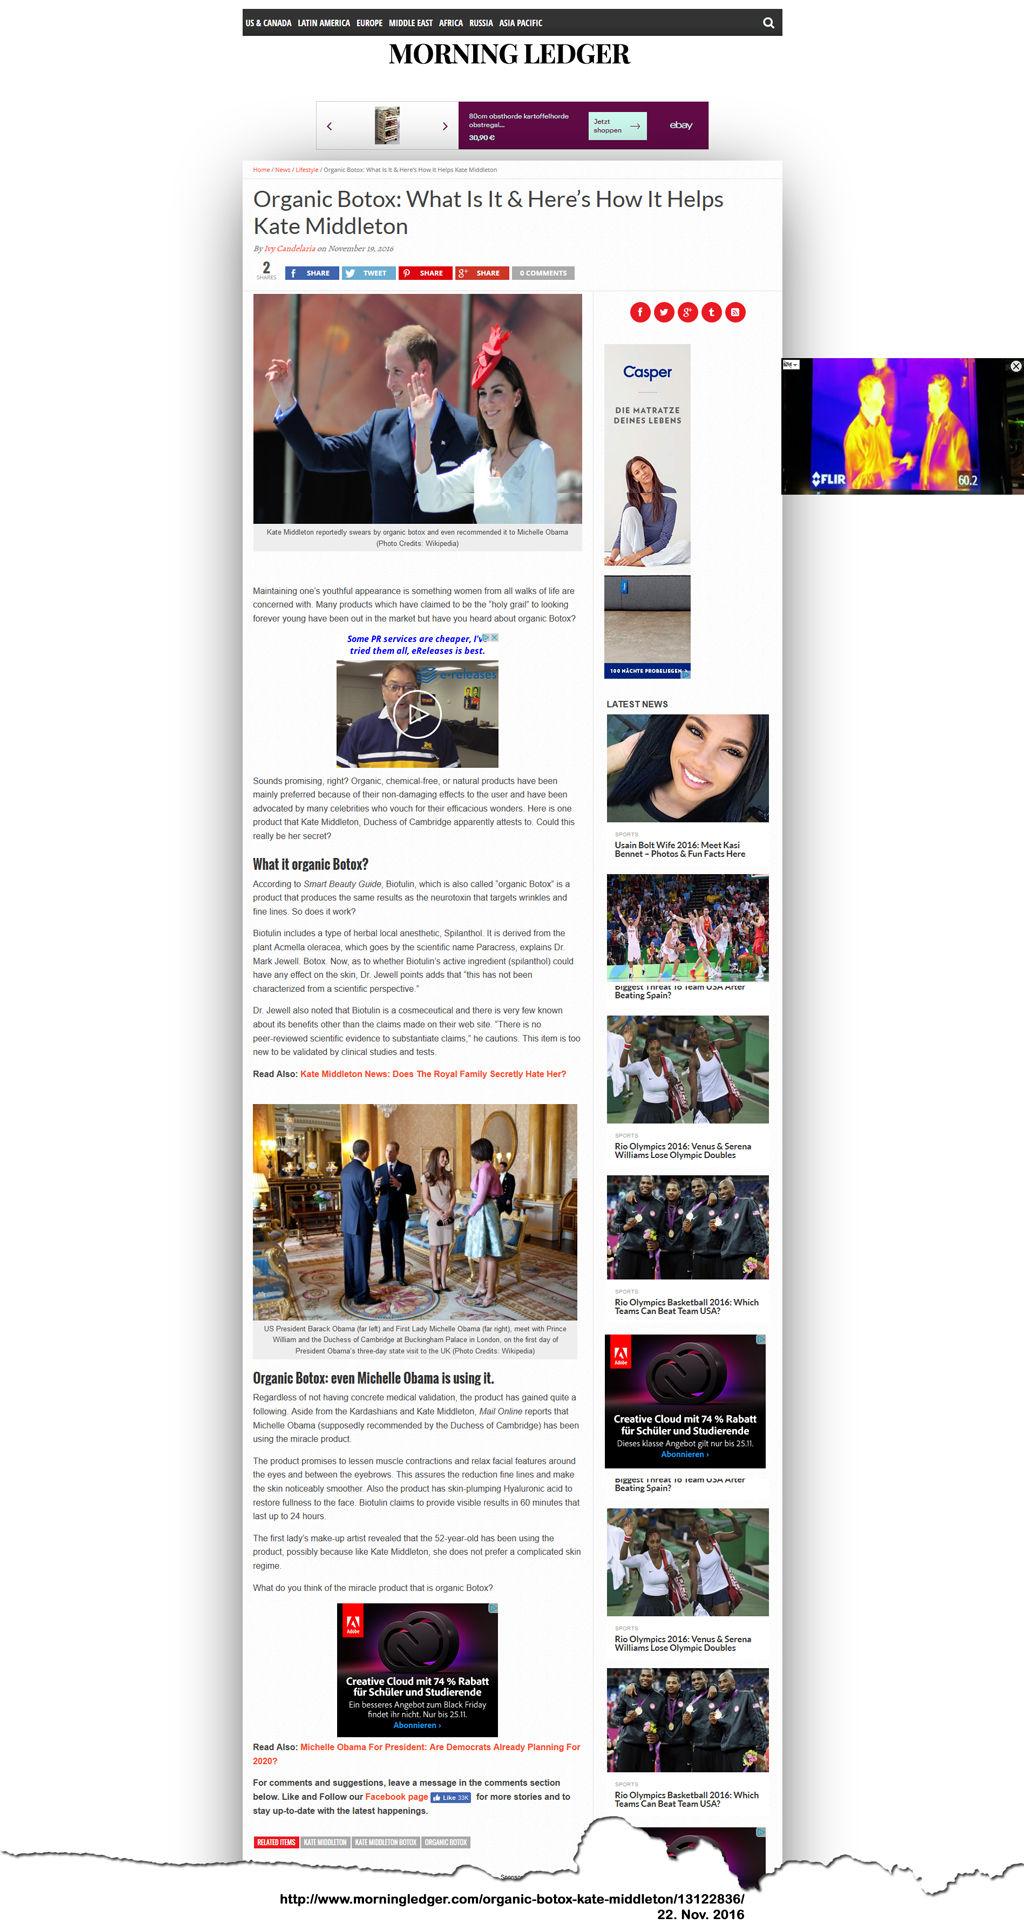 Kate Middleton Botox secreat